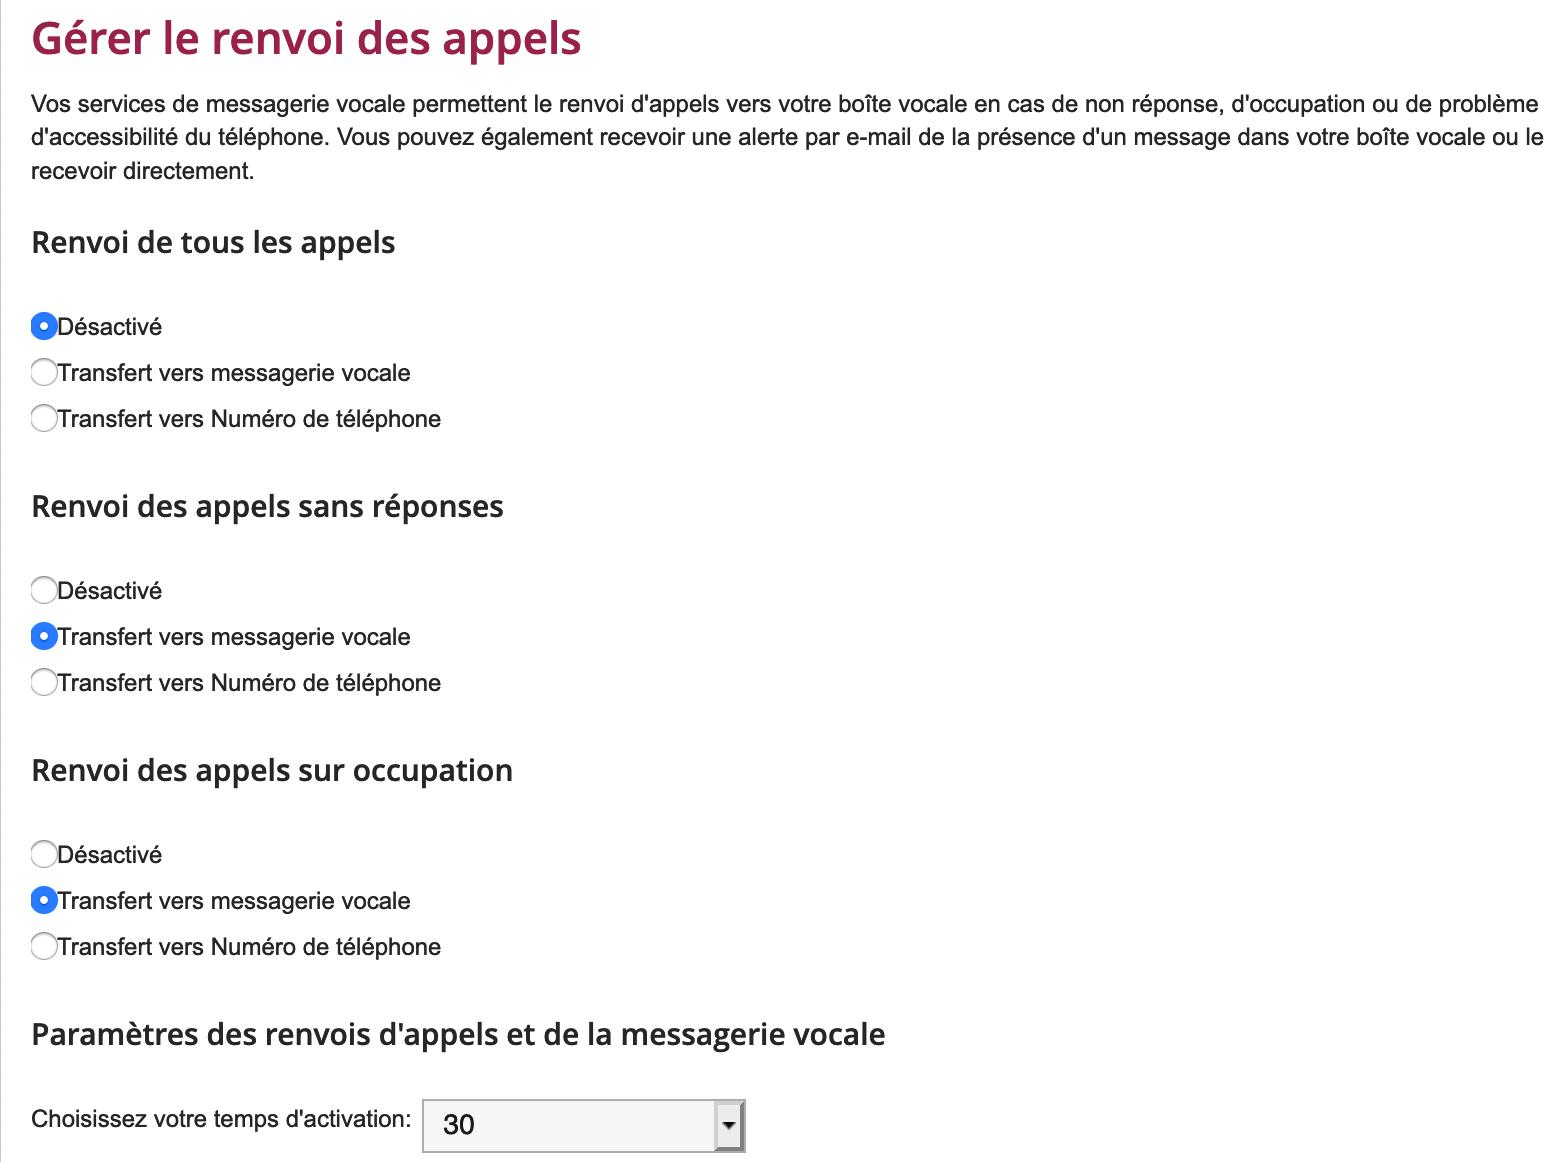 renvoi_sans_reponse.png